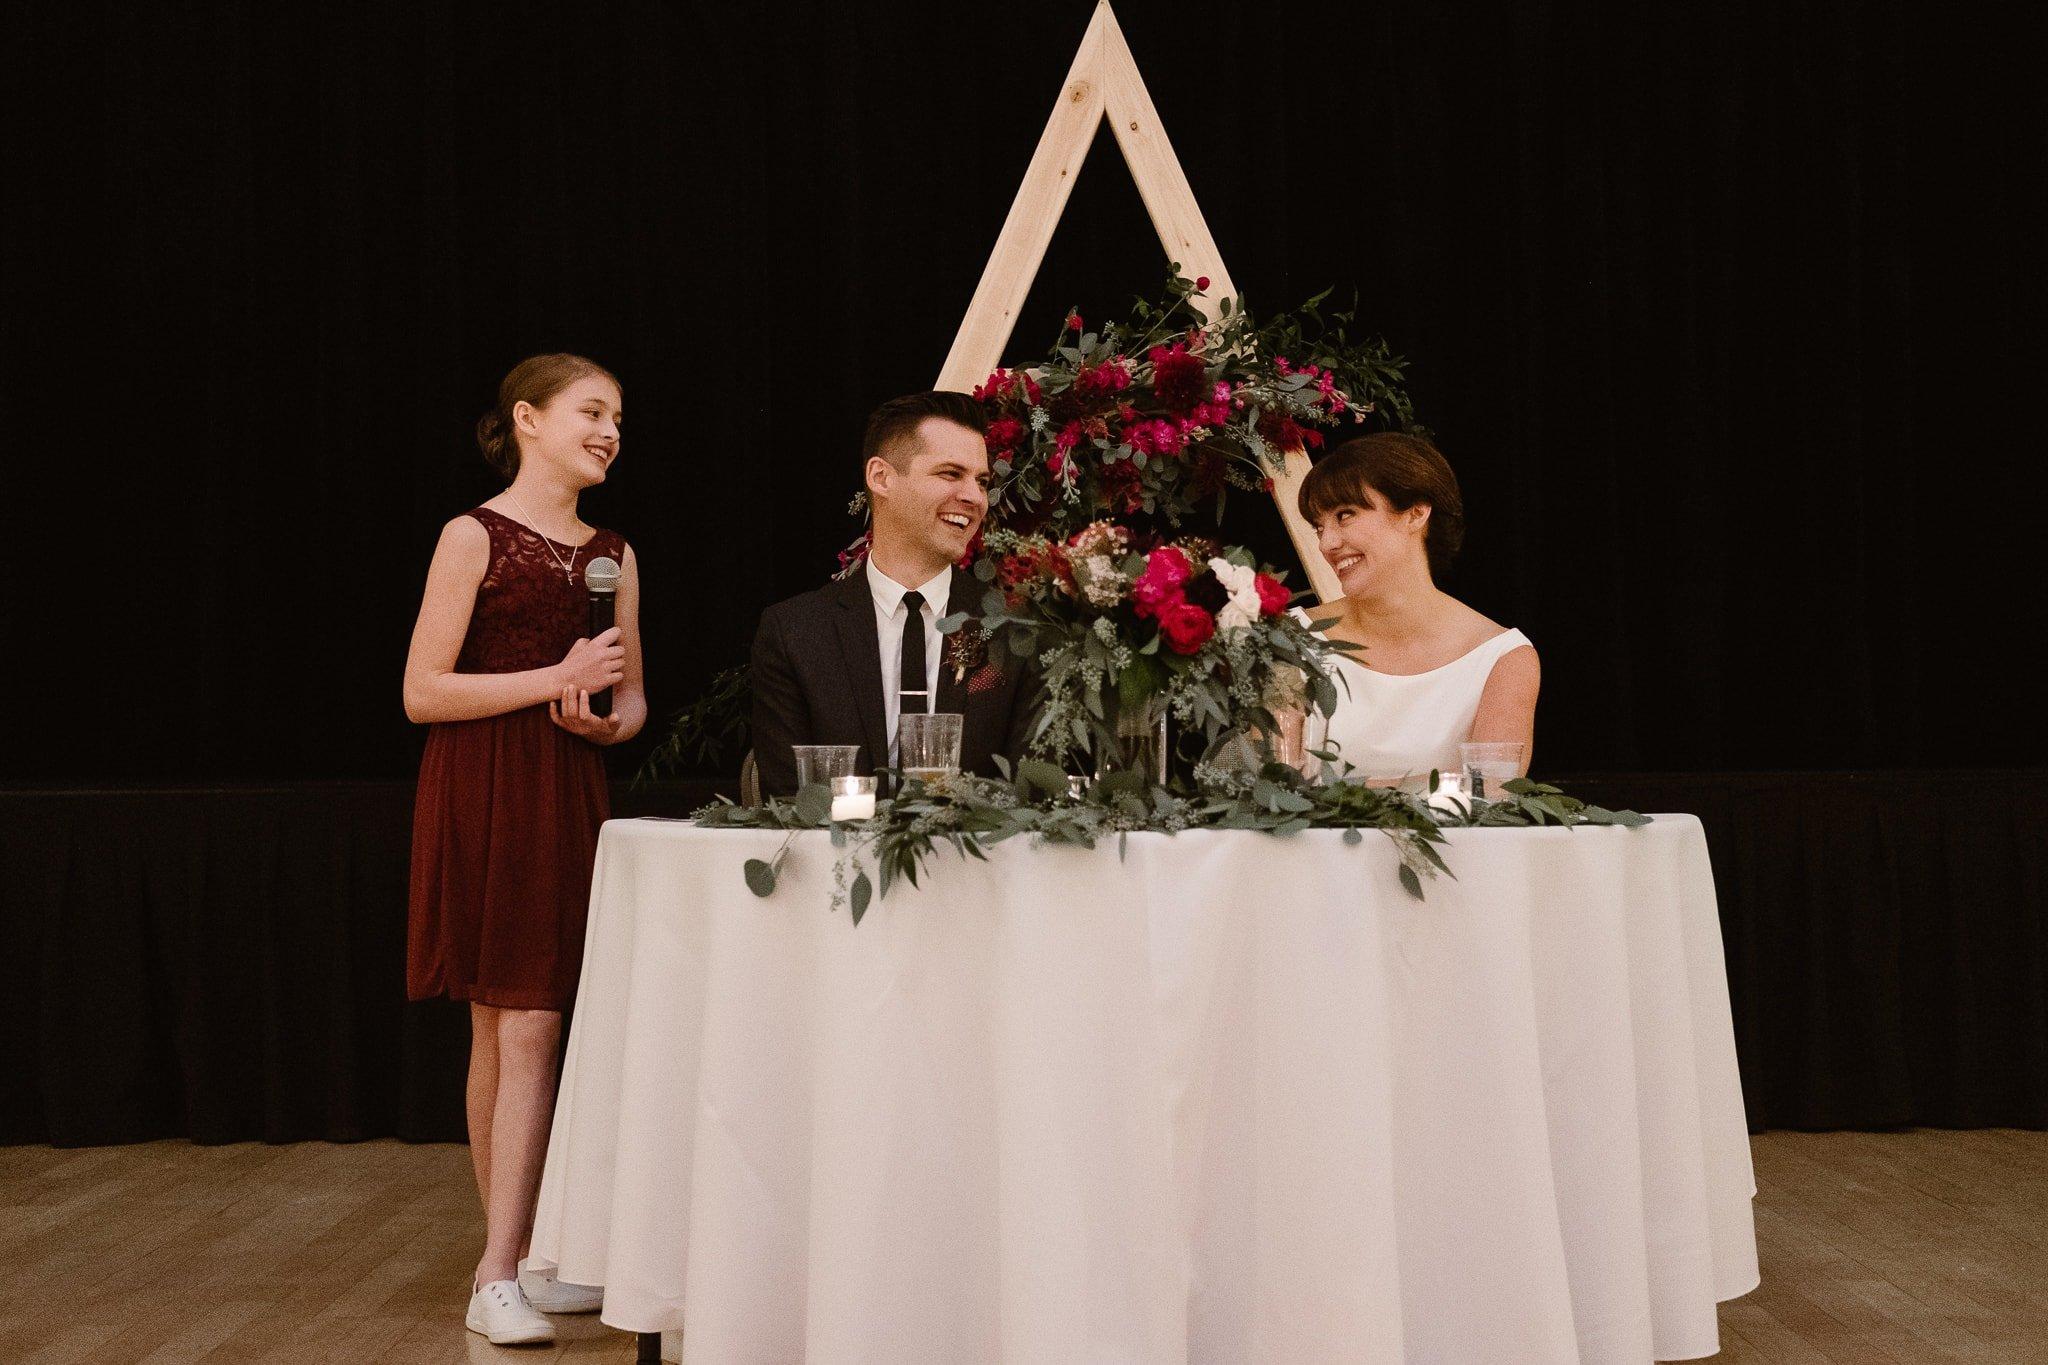 Silverthorne Pavilion wedding photography, Colorado wedding photographer, wedding toasts and speeches